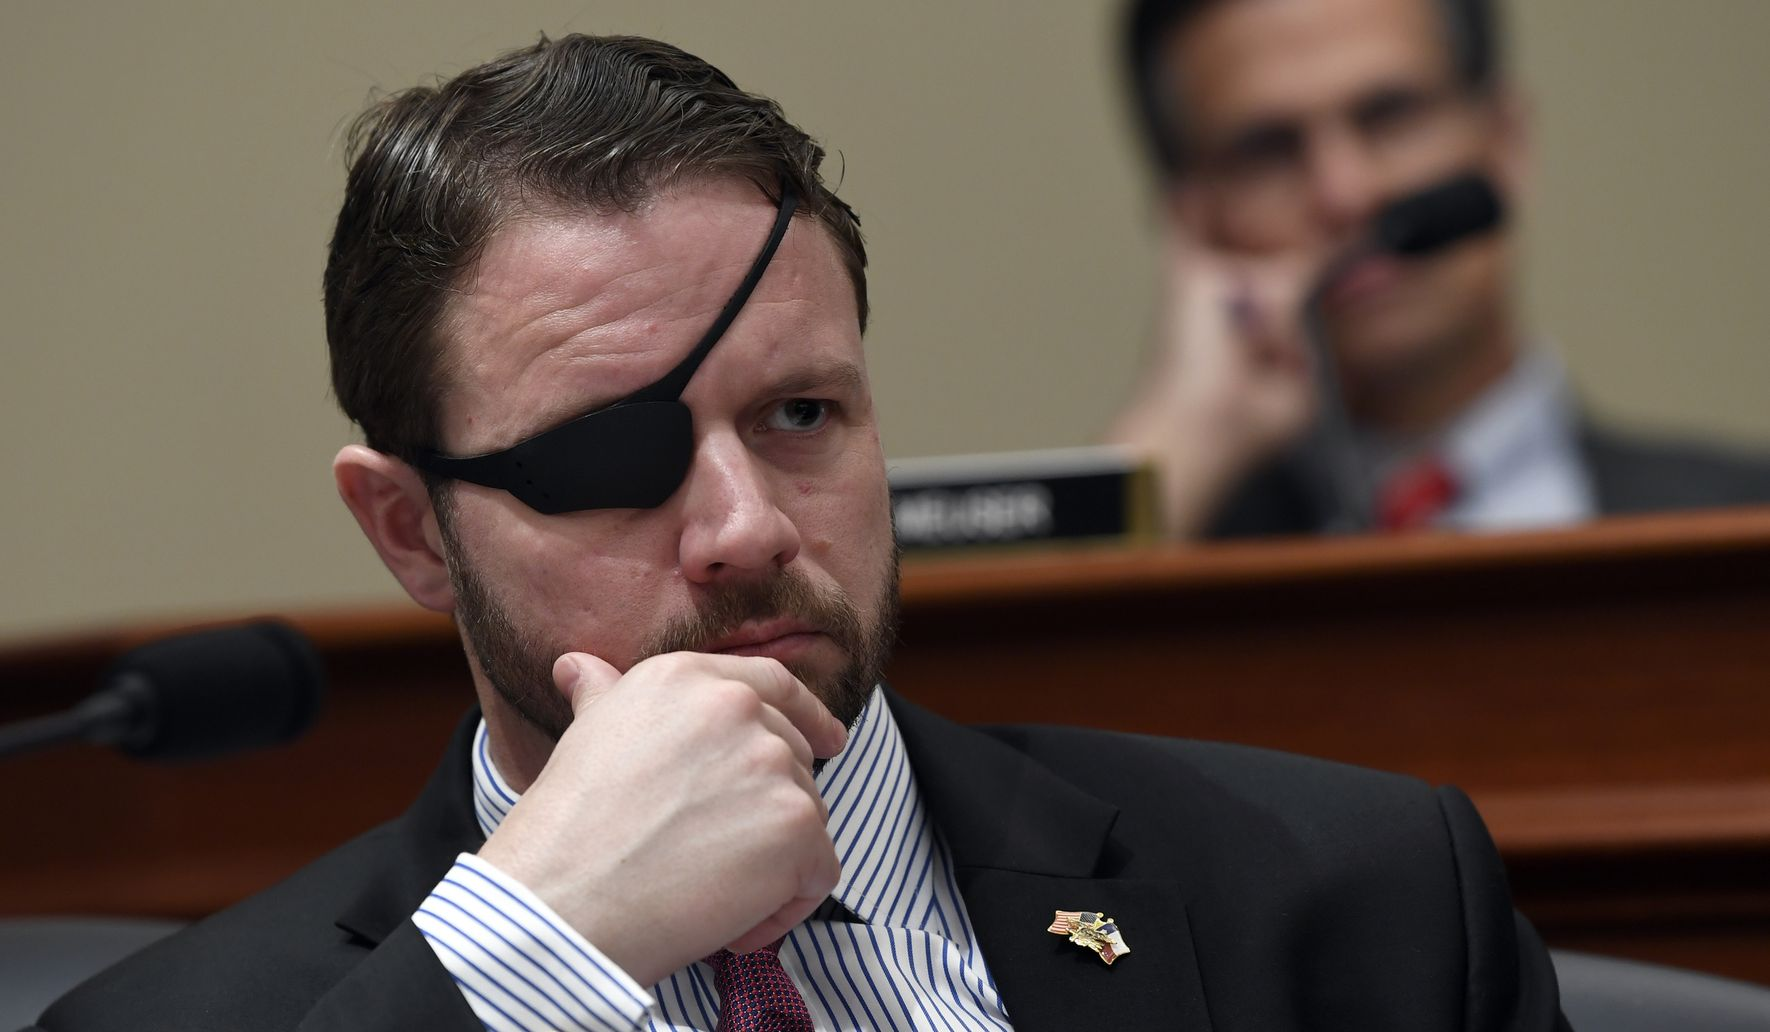 Former Navy SEAL and Texas congressman Dan Crenshaw criticizes Trump's Syria withdrawal